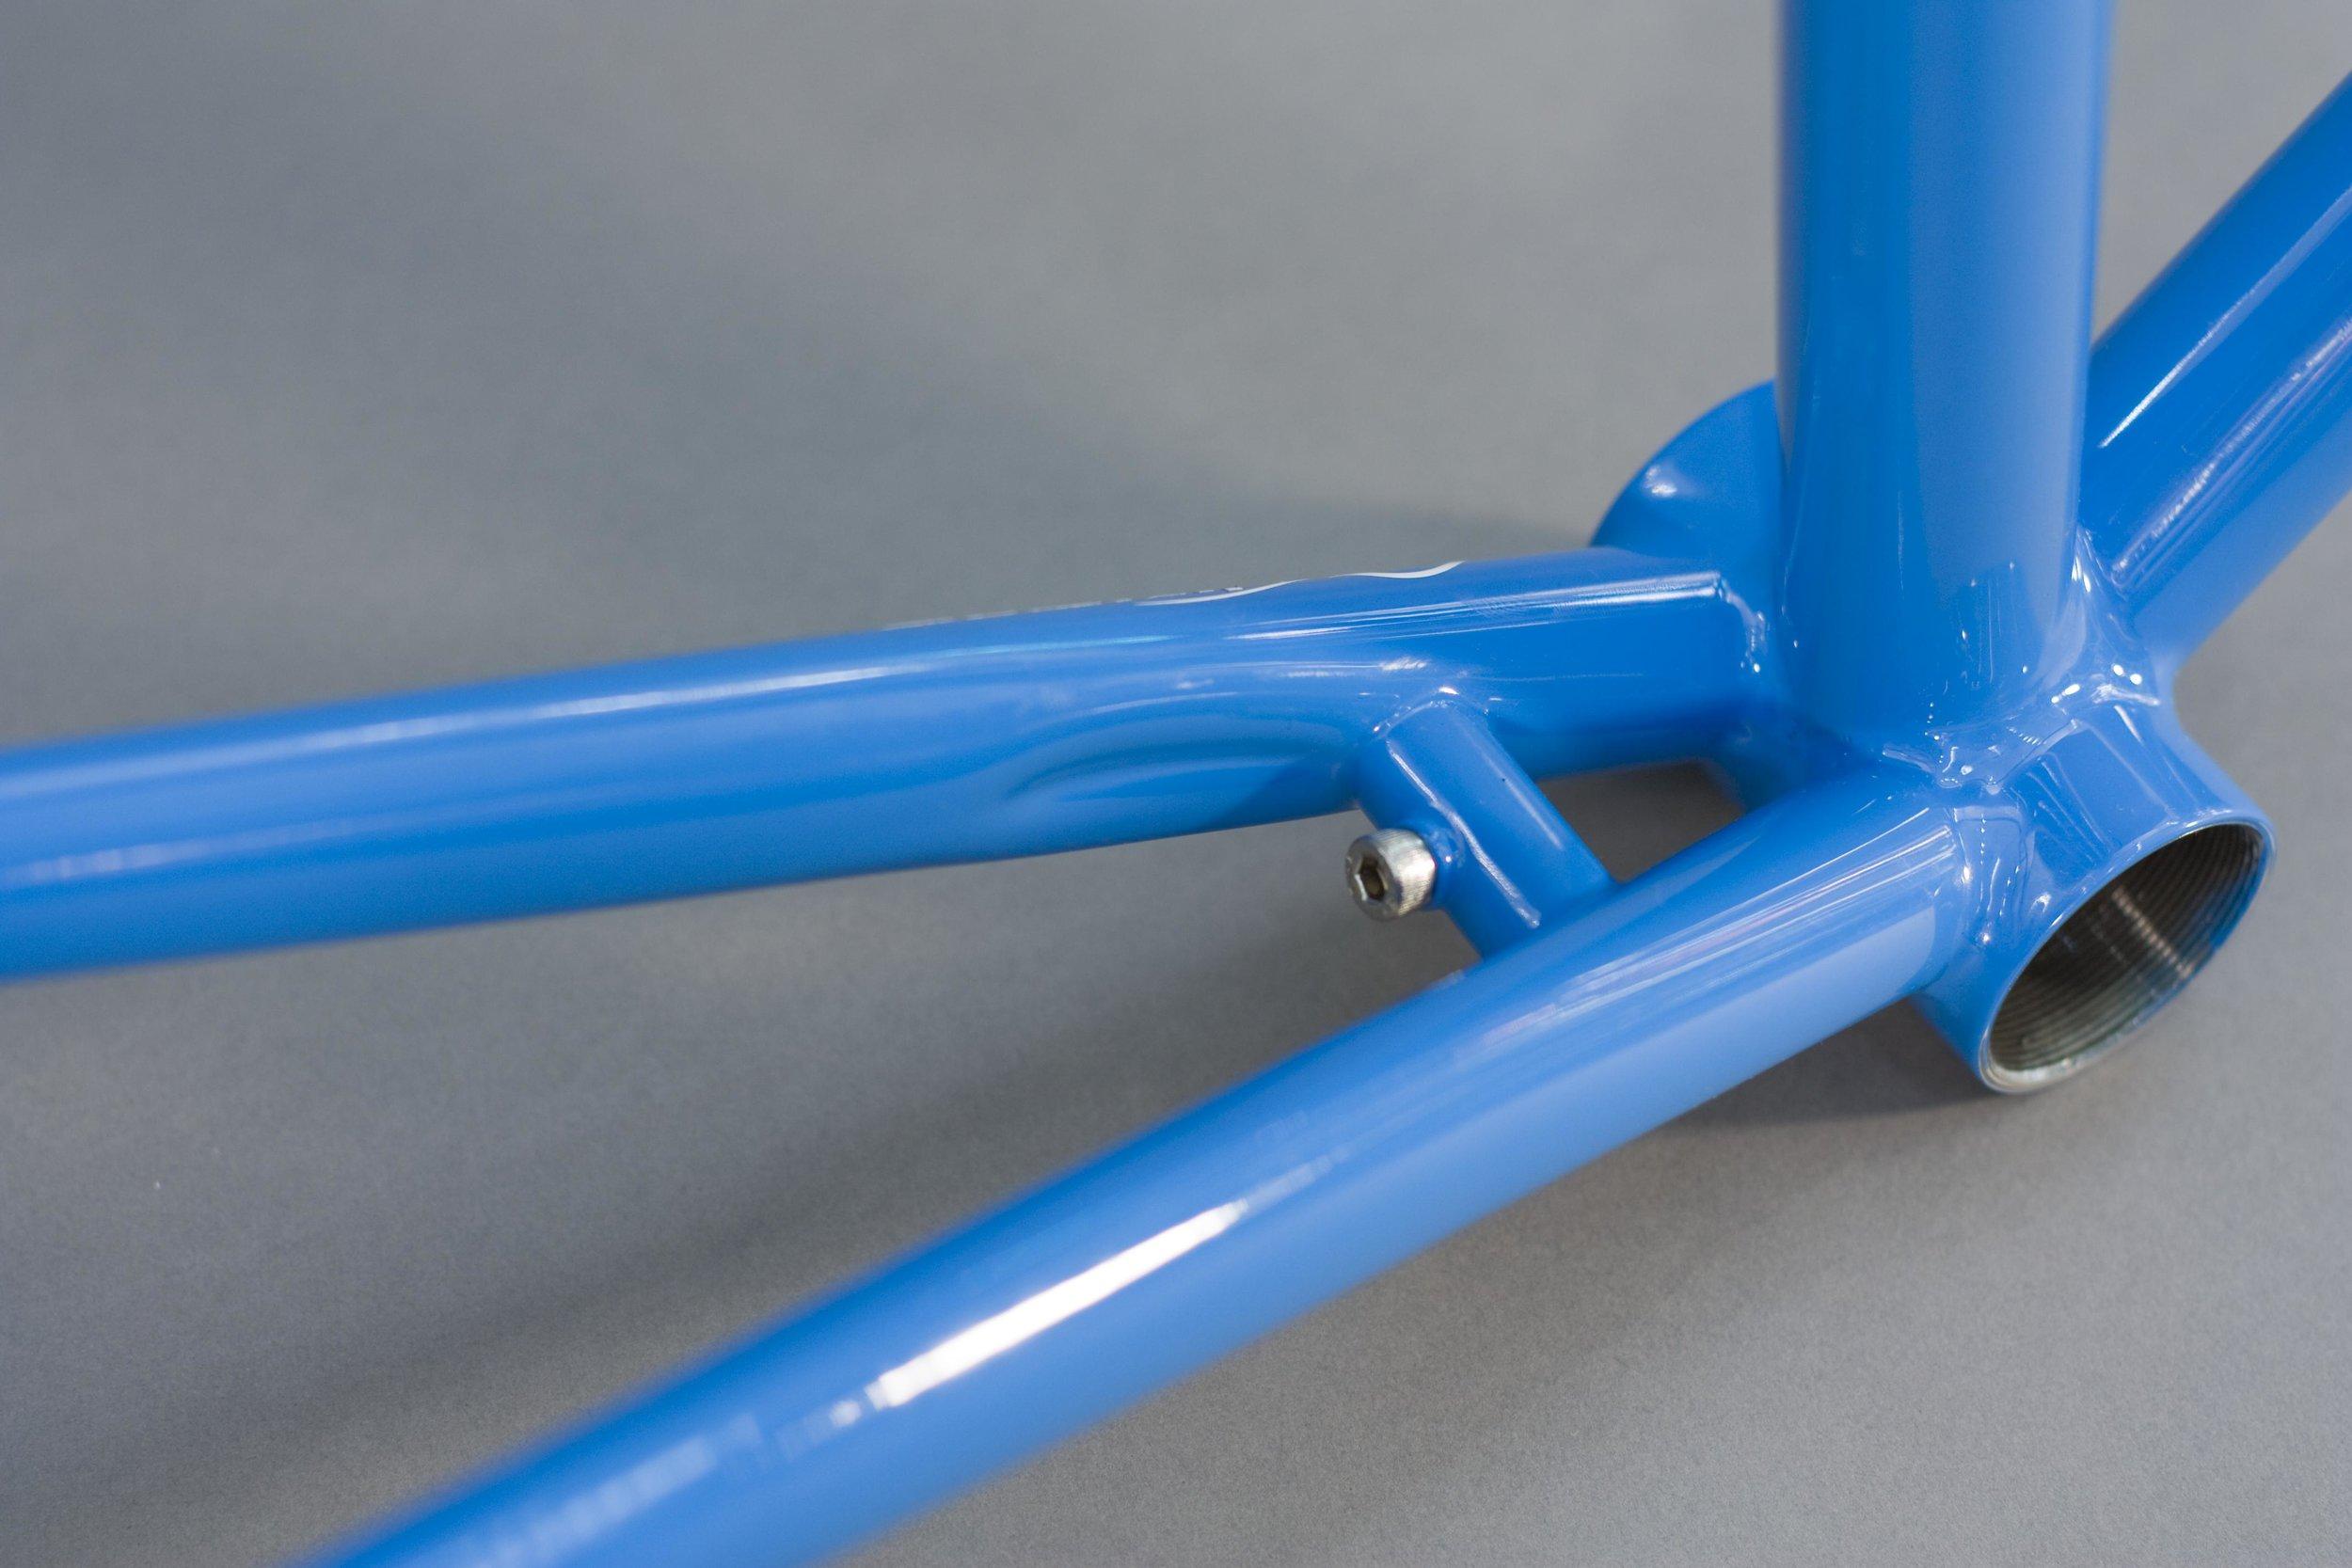 56cm-winter-bicycles-built-pelican_8269878425_o.jpg